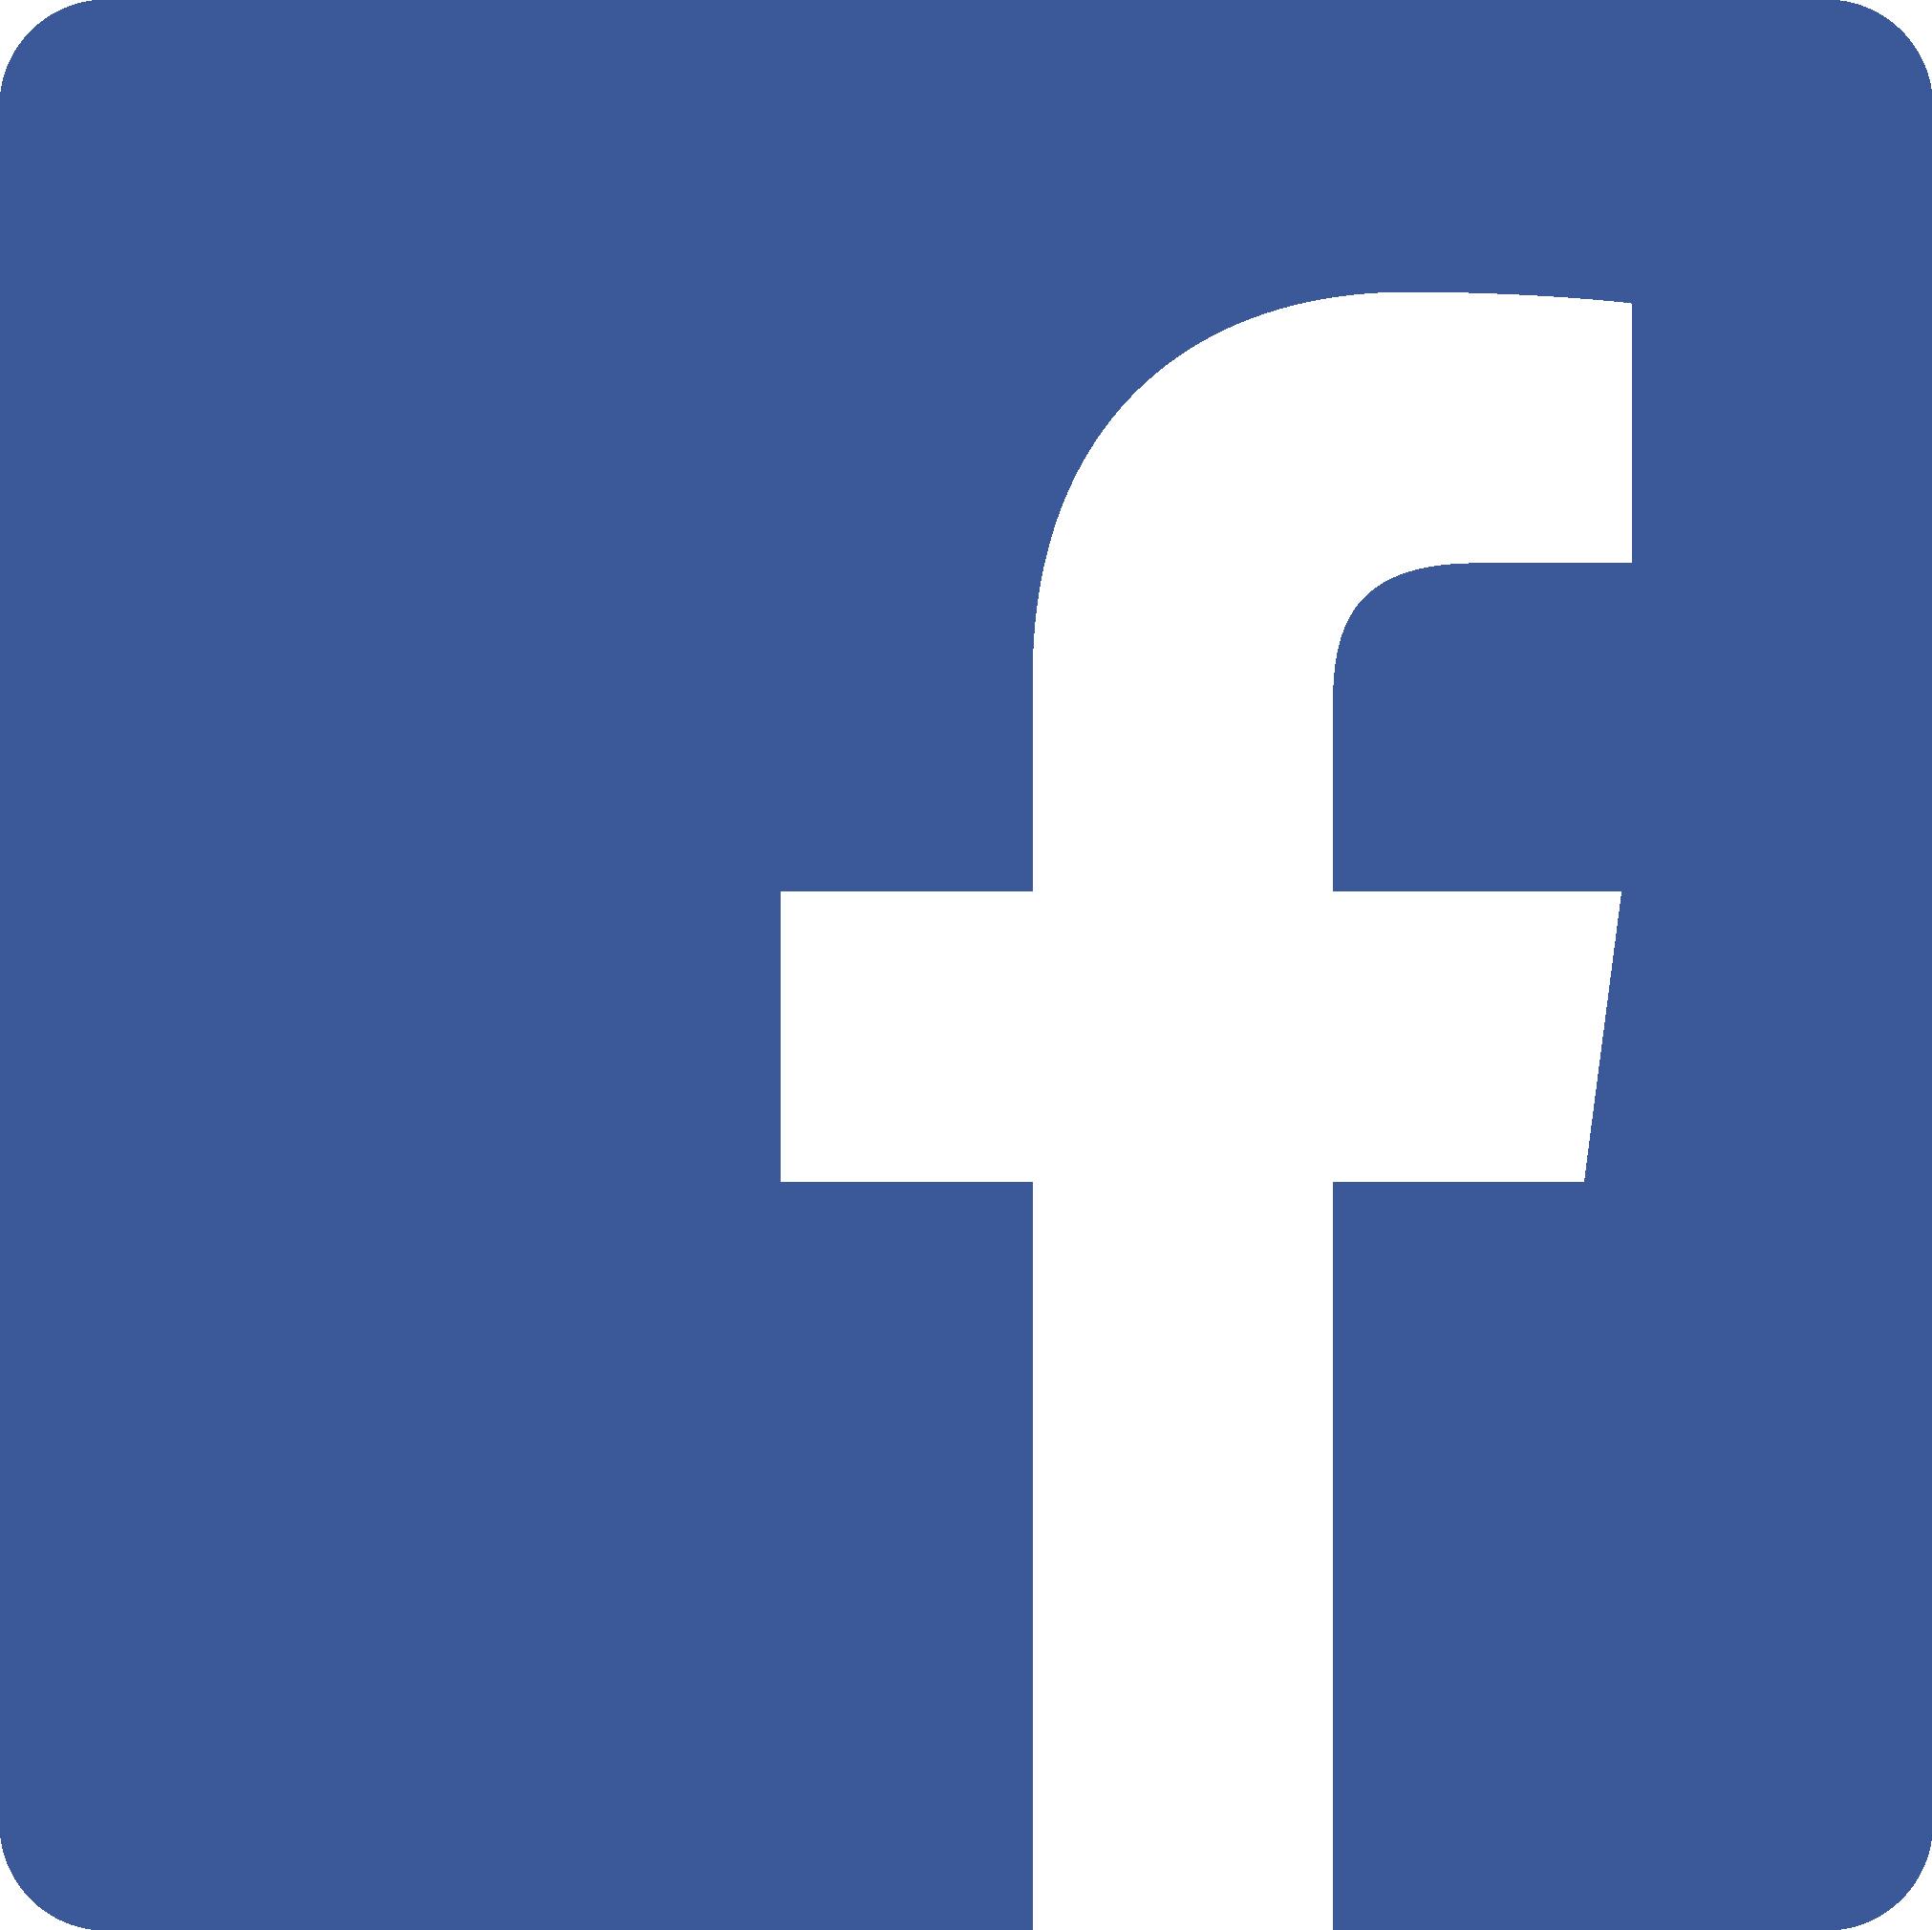 Facebook Historienbilder.de